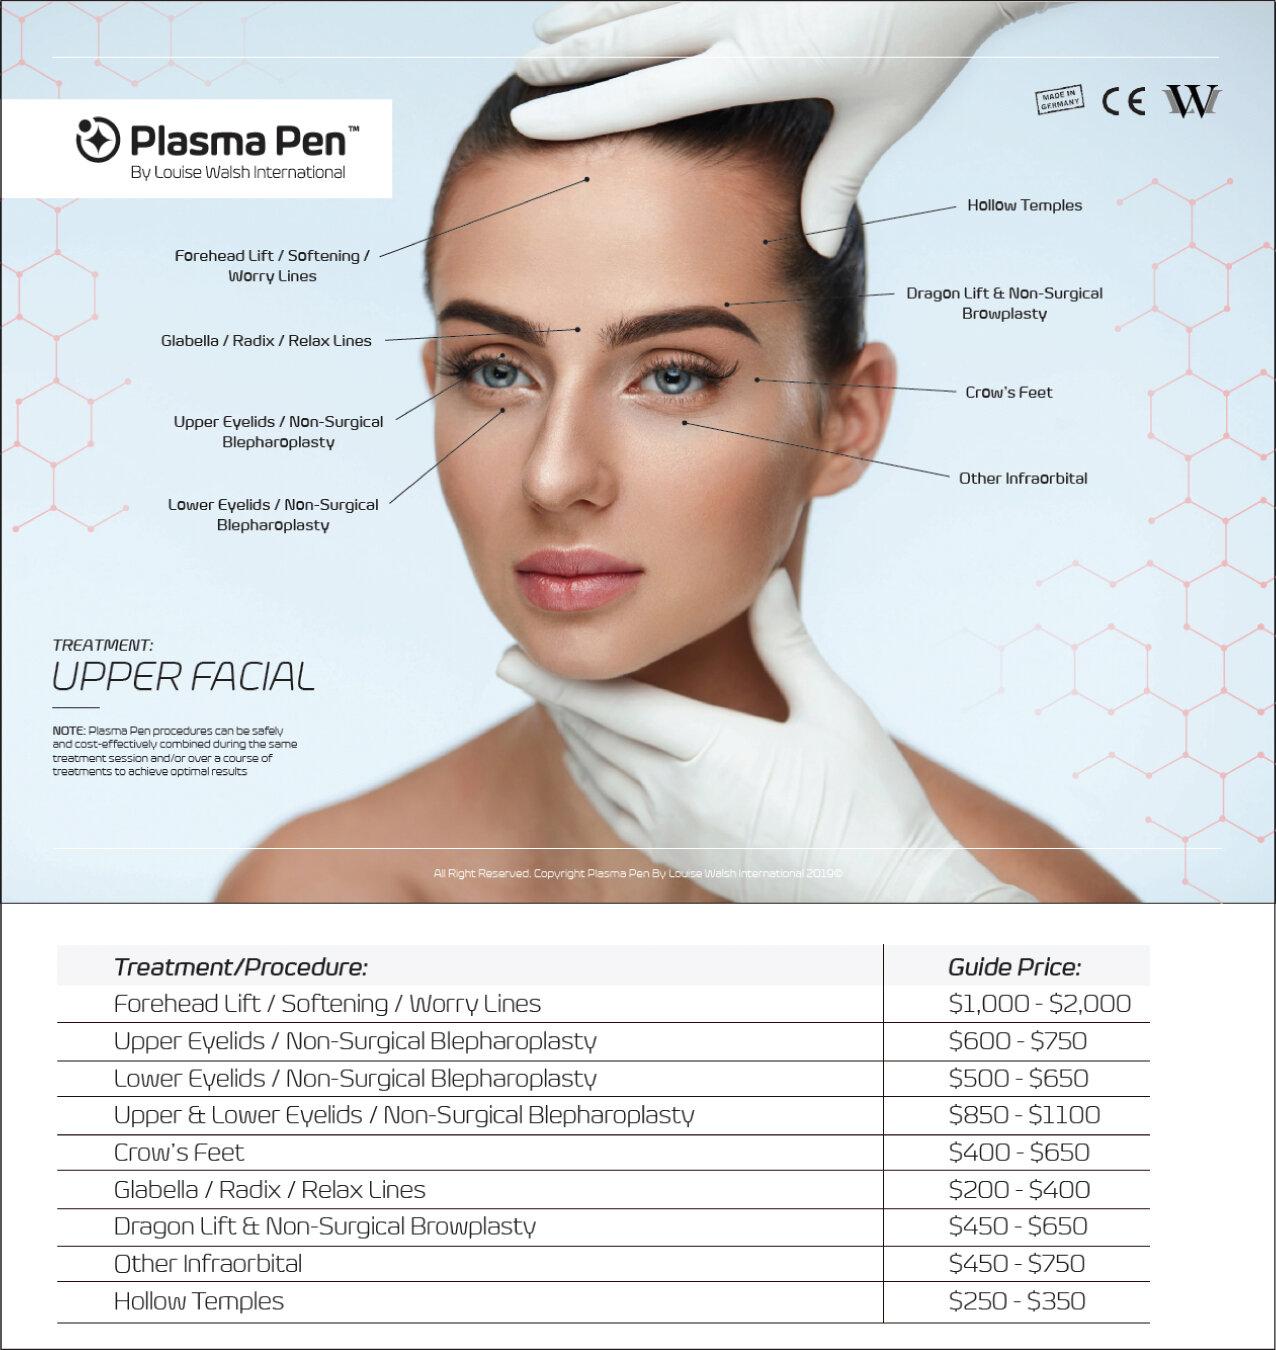 Sckin Craft Beauty - PlasmaPen Pricing